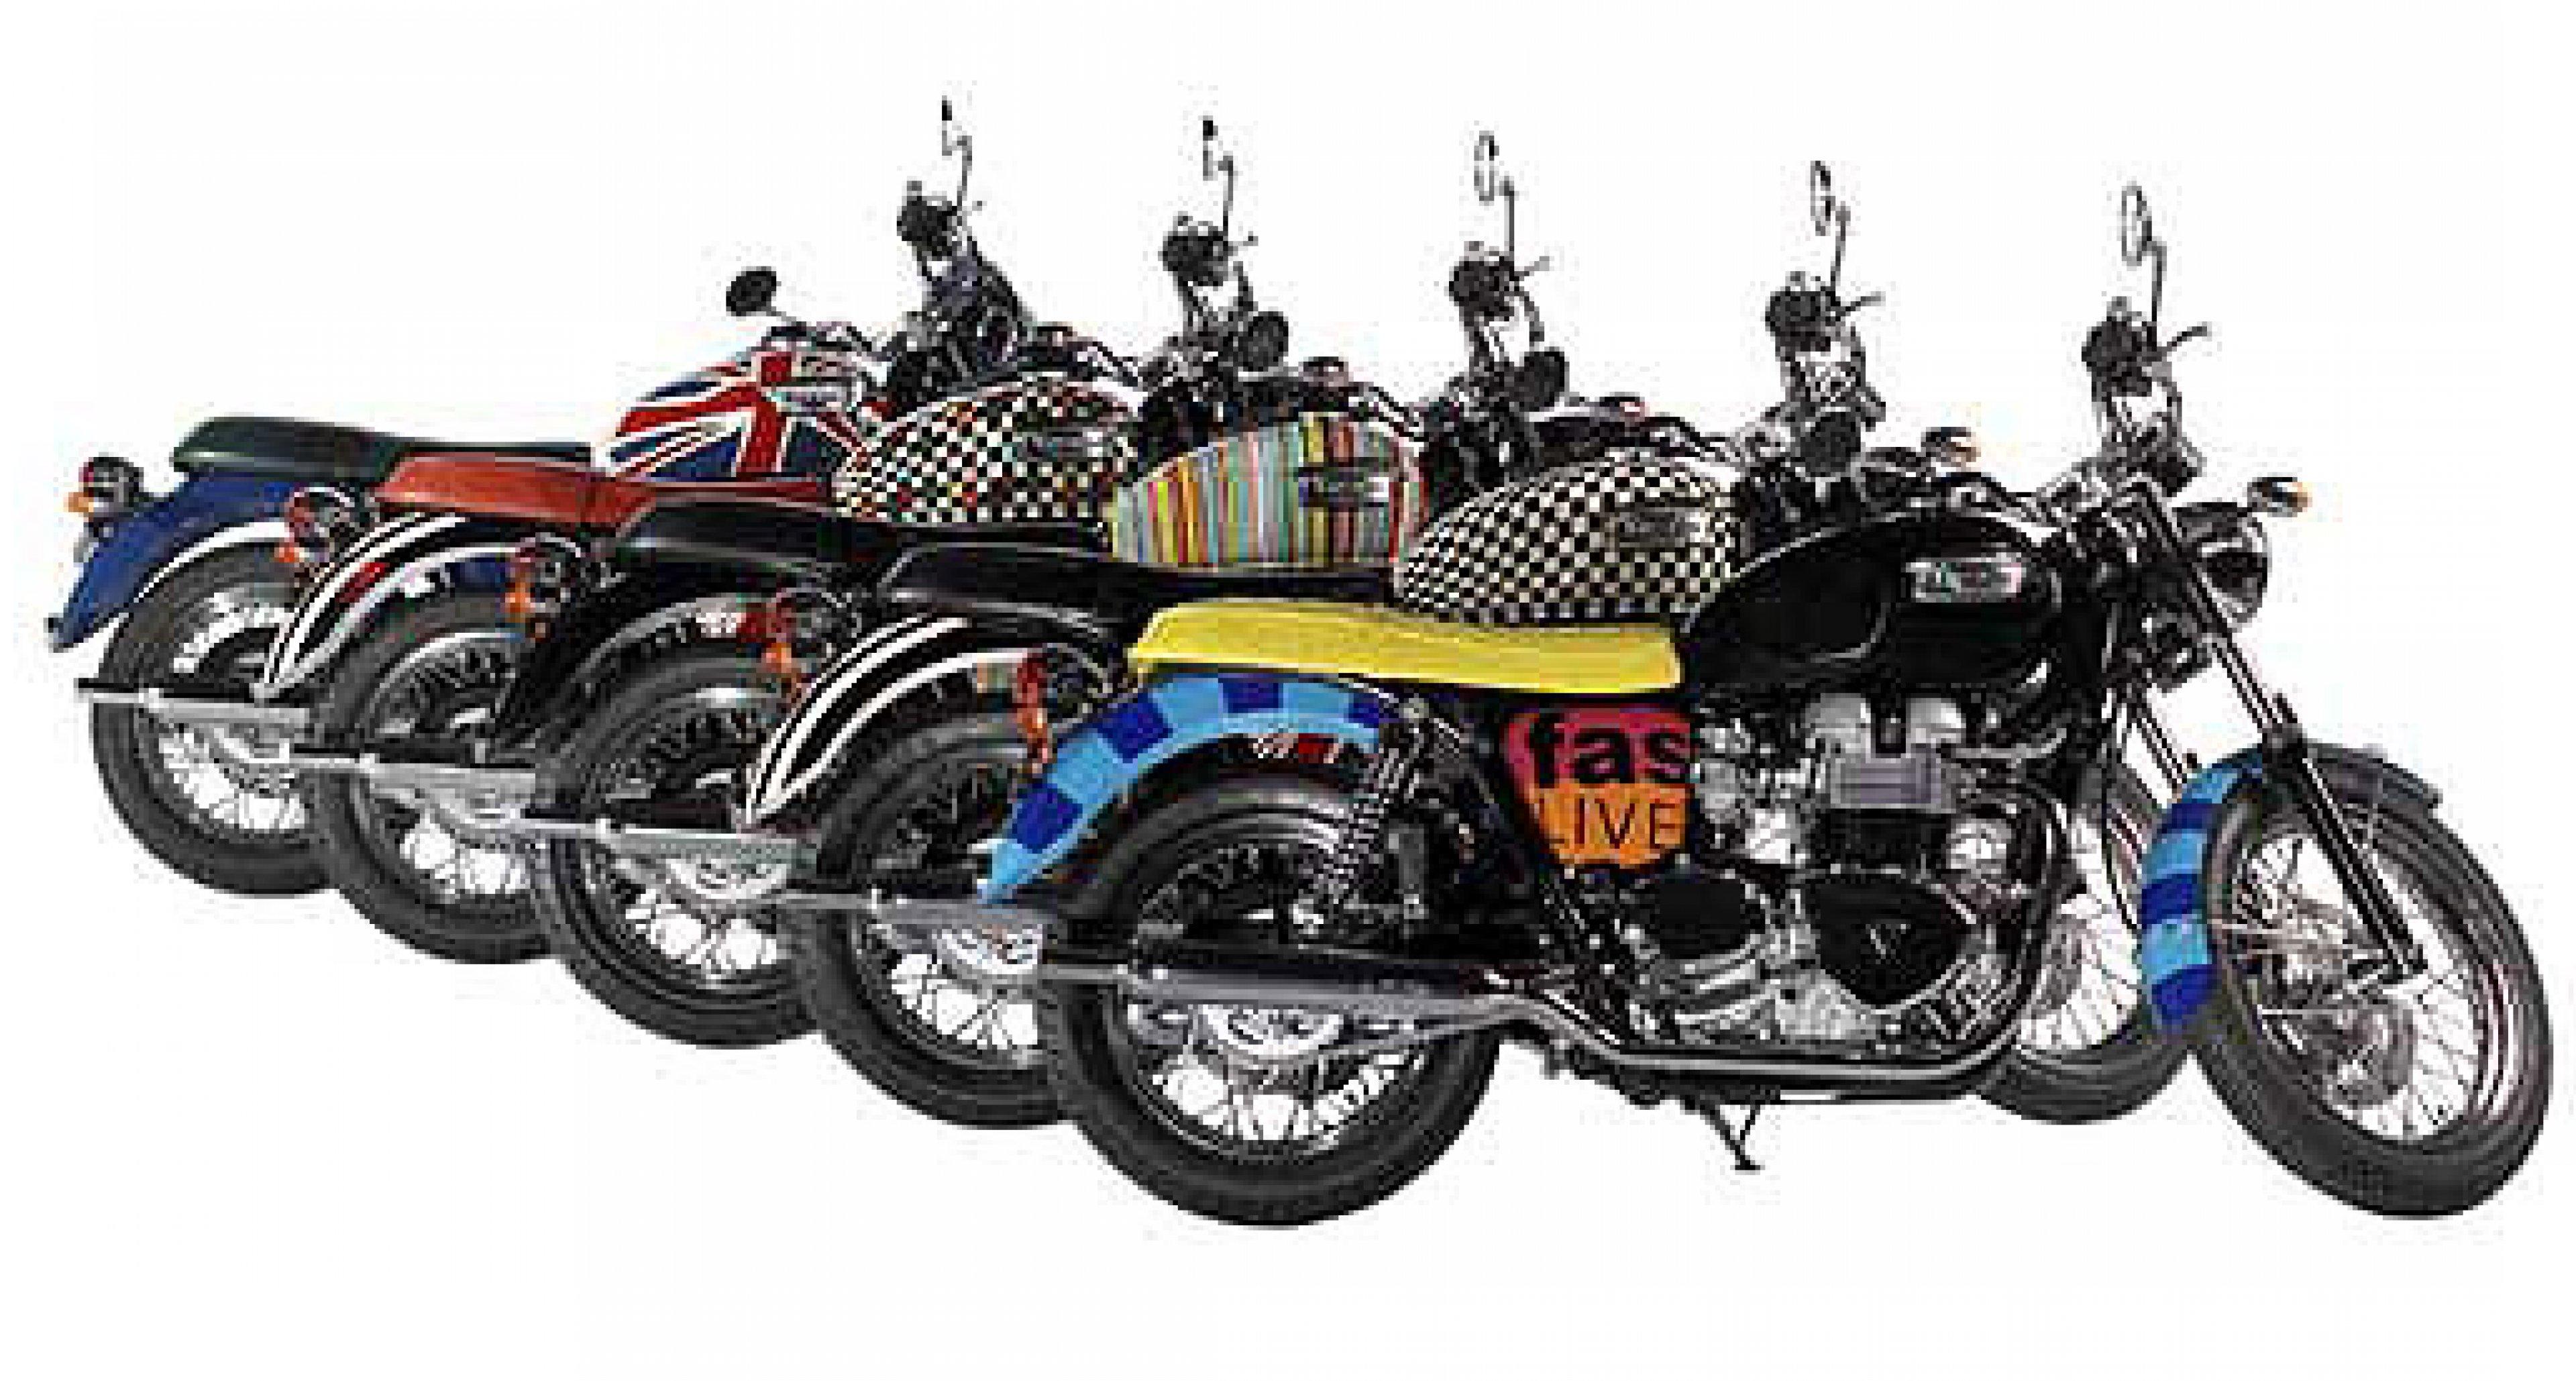 Triumph Bonneville T100 by Paul Smith: Truly British